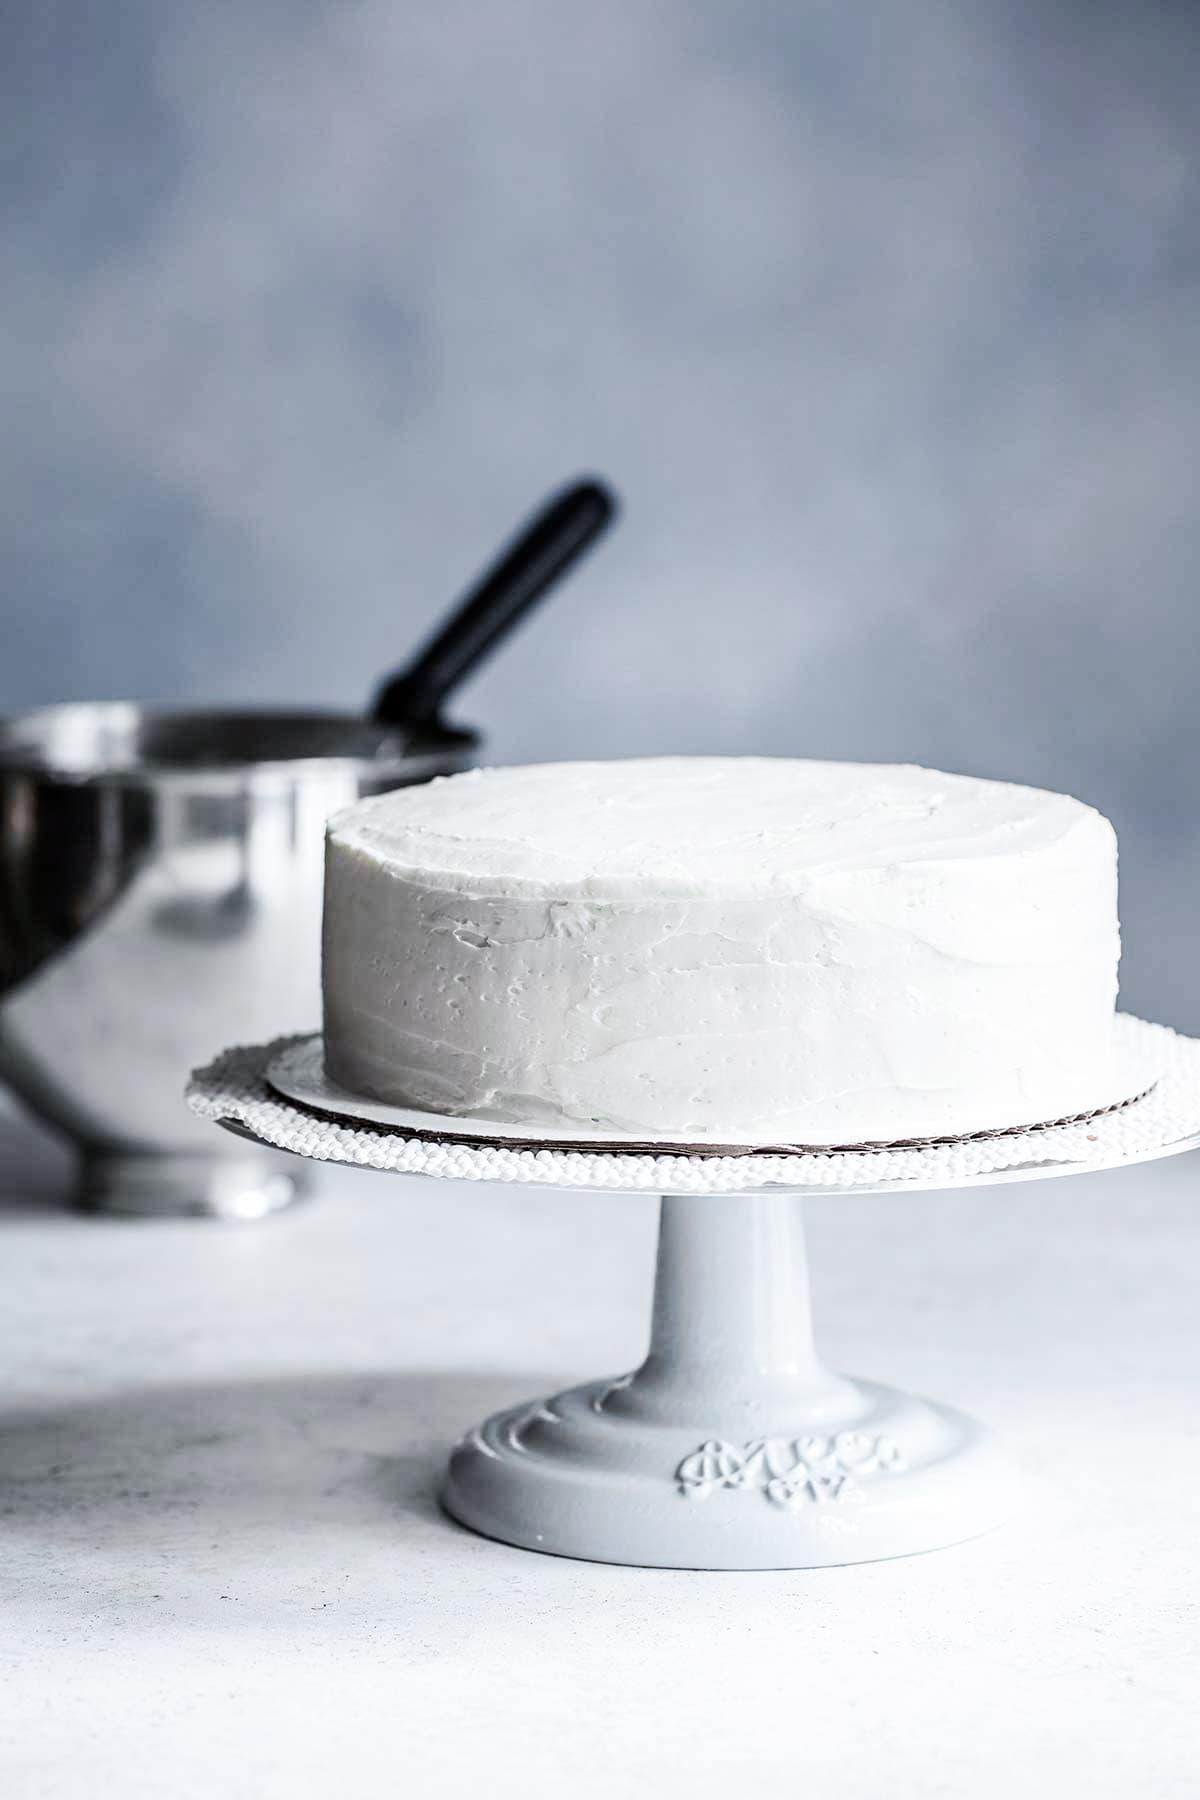 Amazing Homemade White Cake Recipe Step By Step Photos Savory Simple Personalised Birthday Cards Petedlily Jamesorg